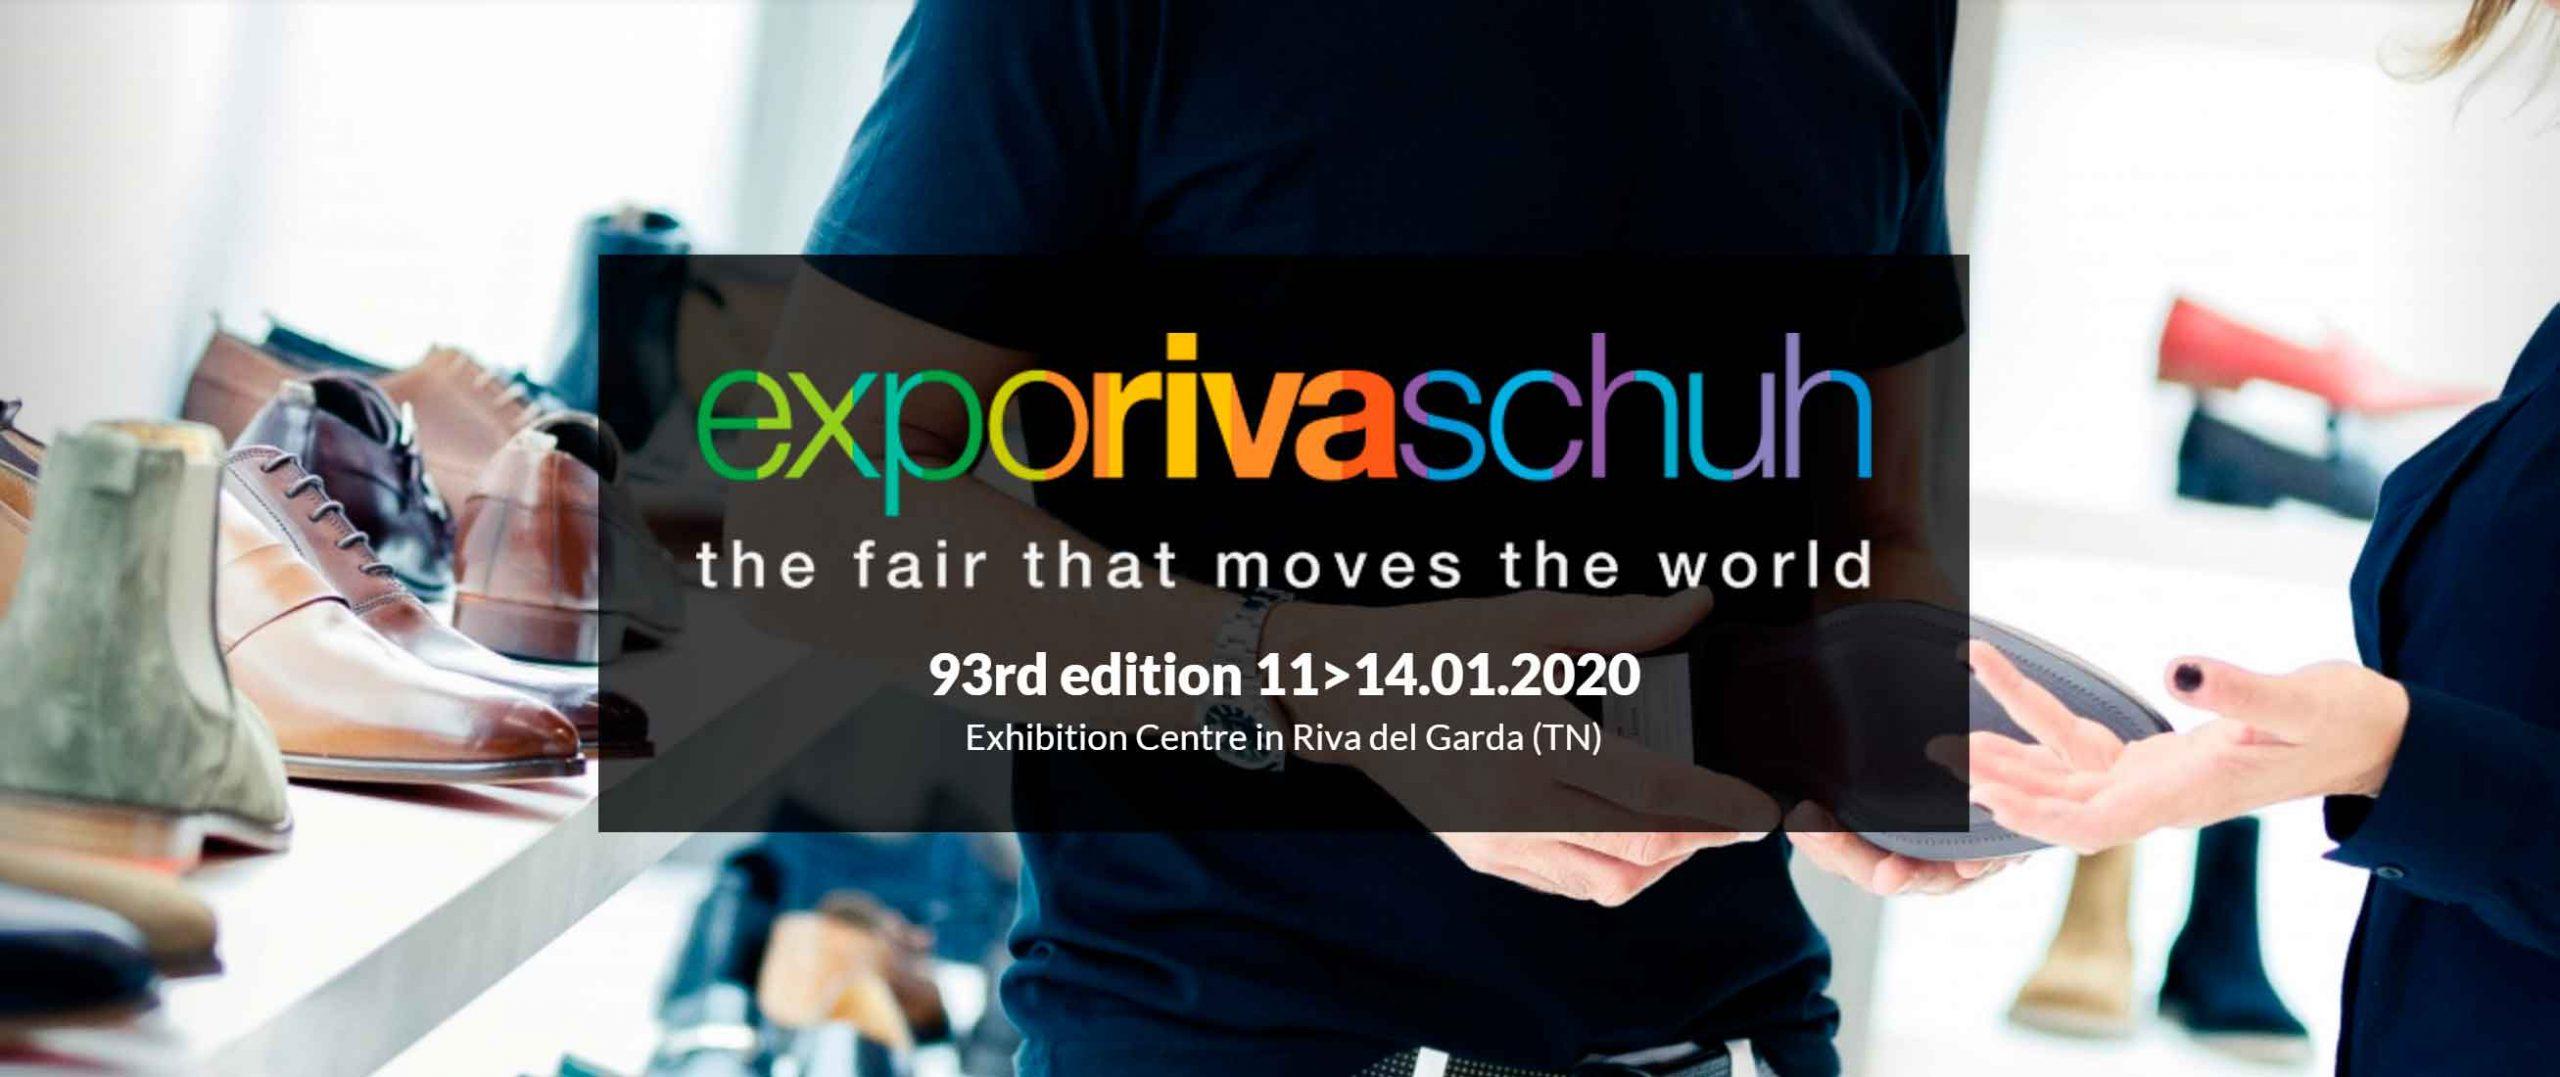 Exporivaschuh January 2020